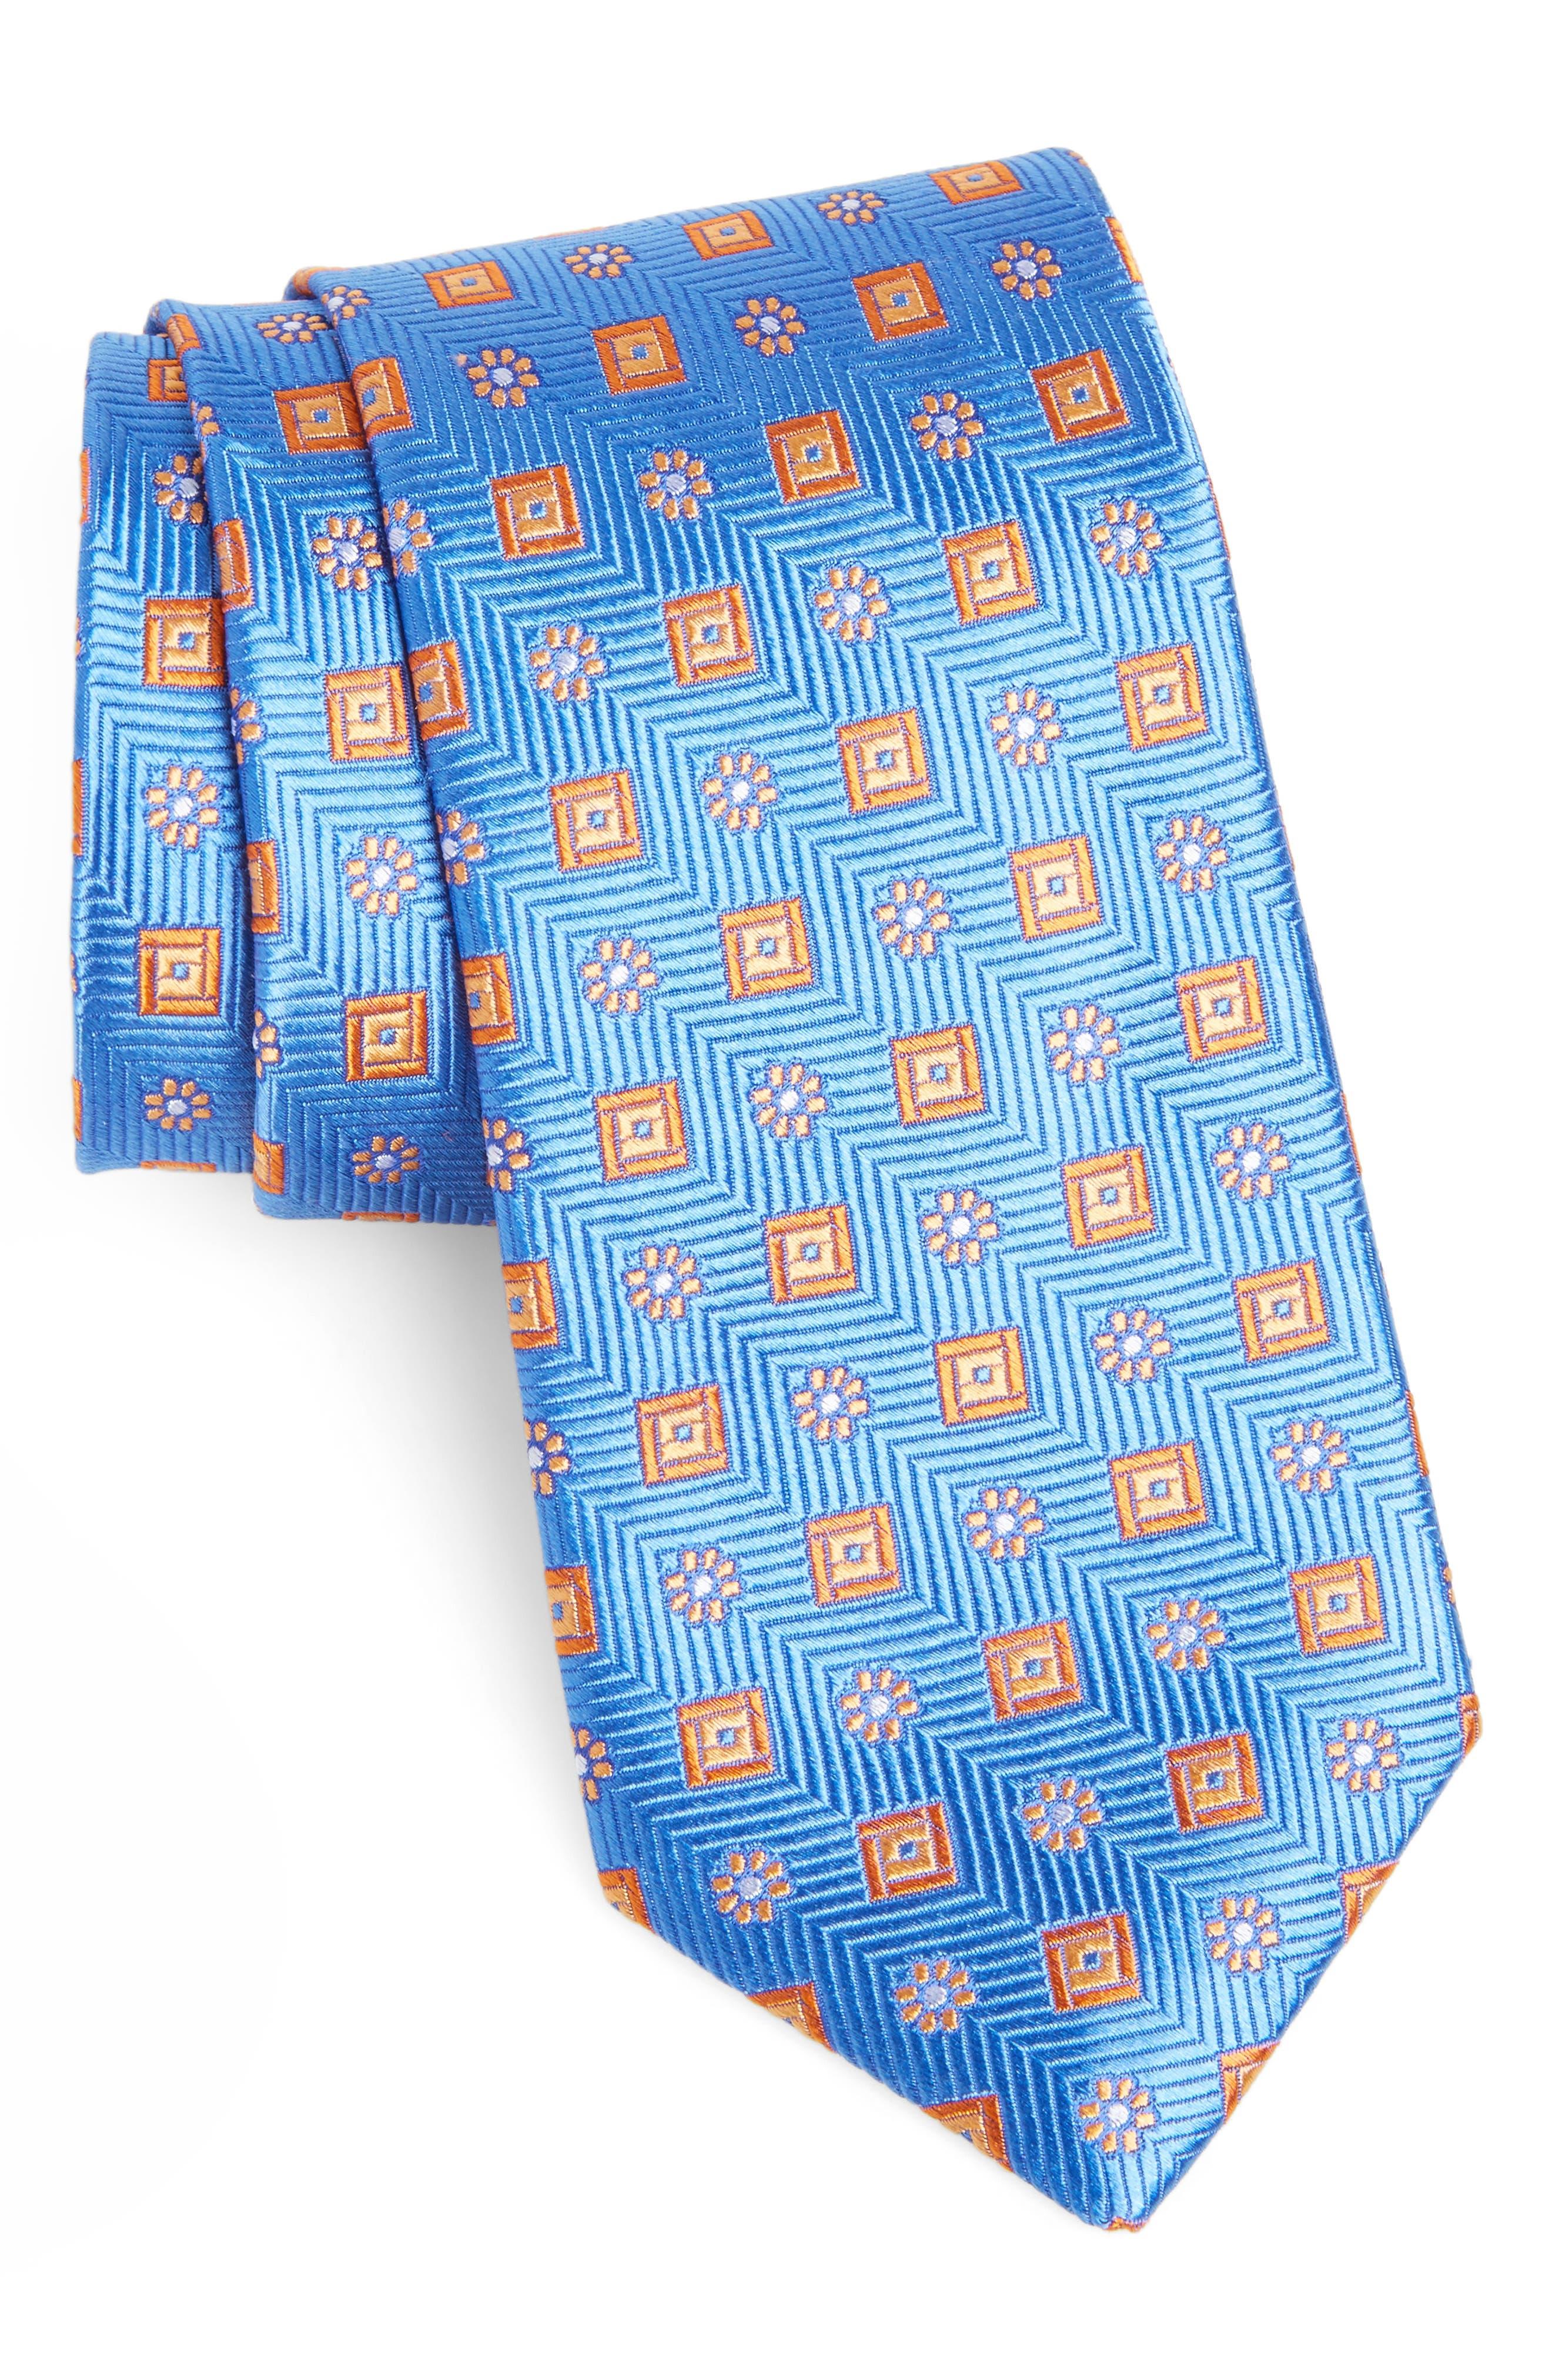 Main Image - Nordstrom Men's Shop Medallion Silk Tie (X-Long)